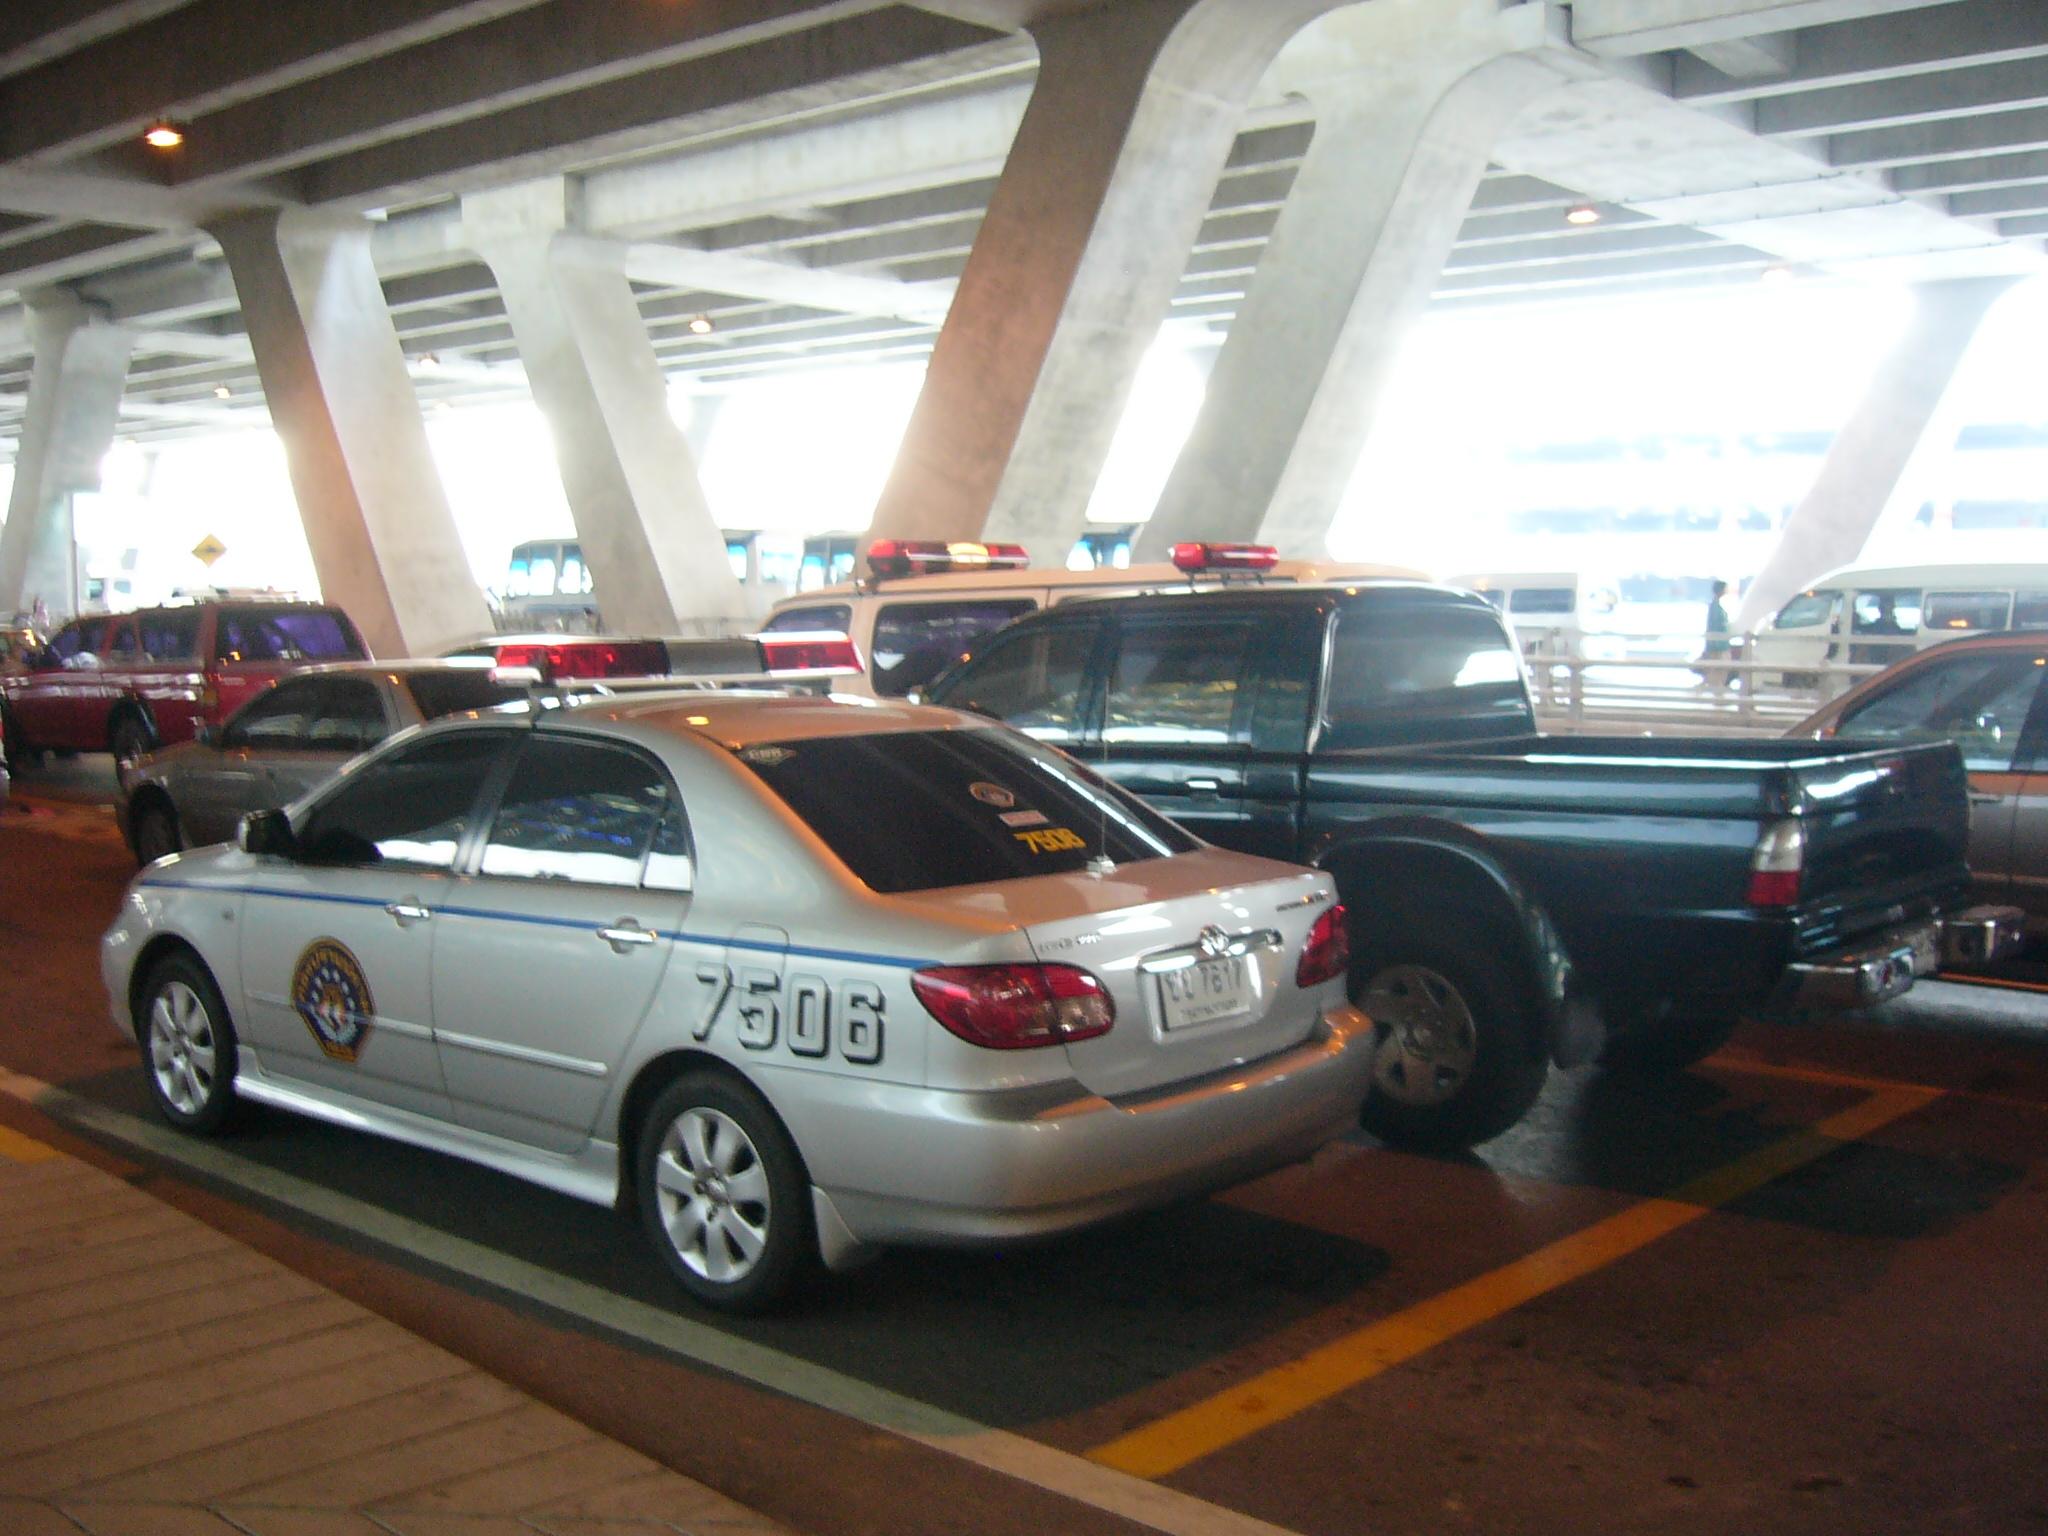 File:Toyota Corolla Altis (E120)   Thai Police Cars